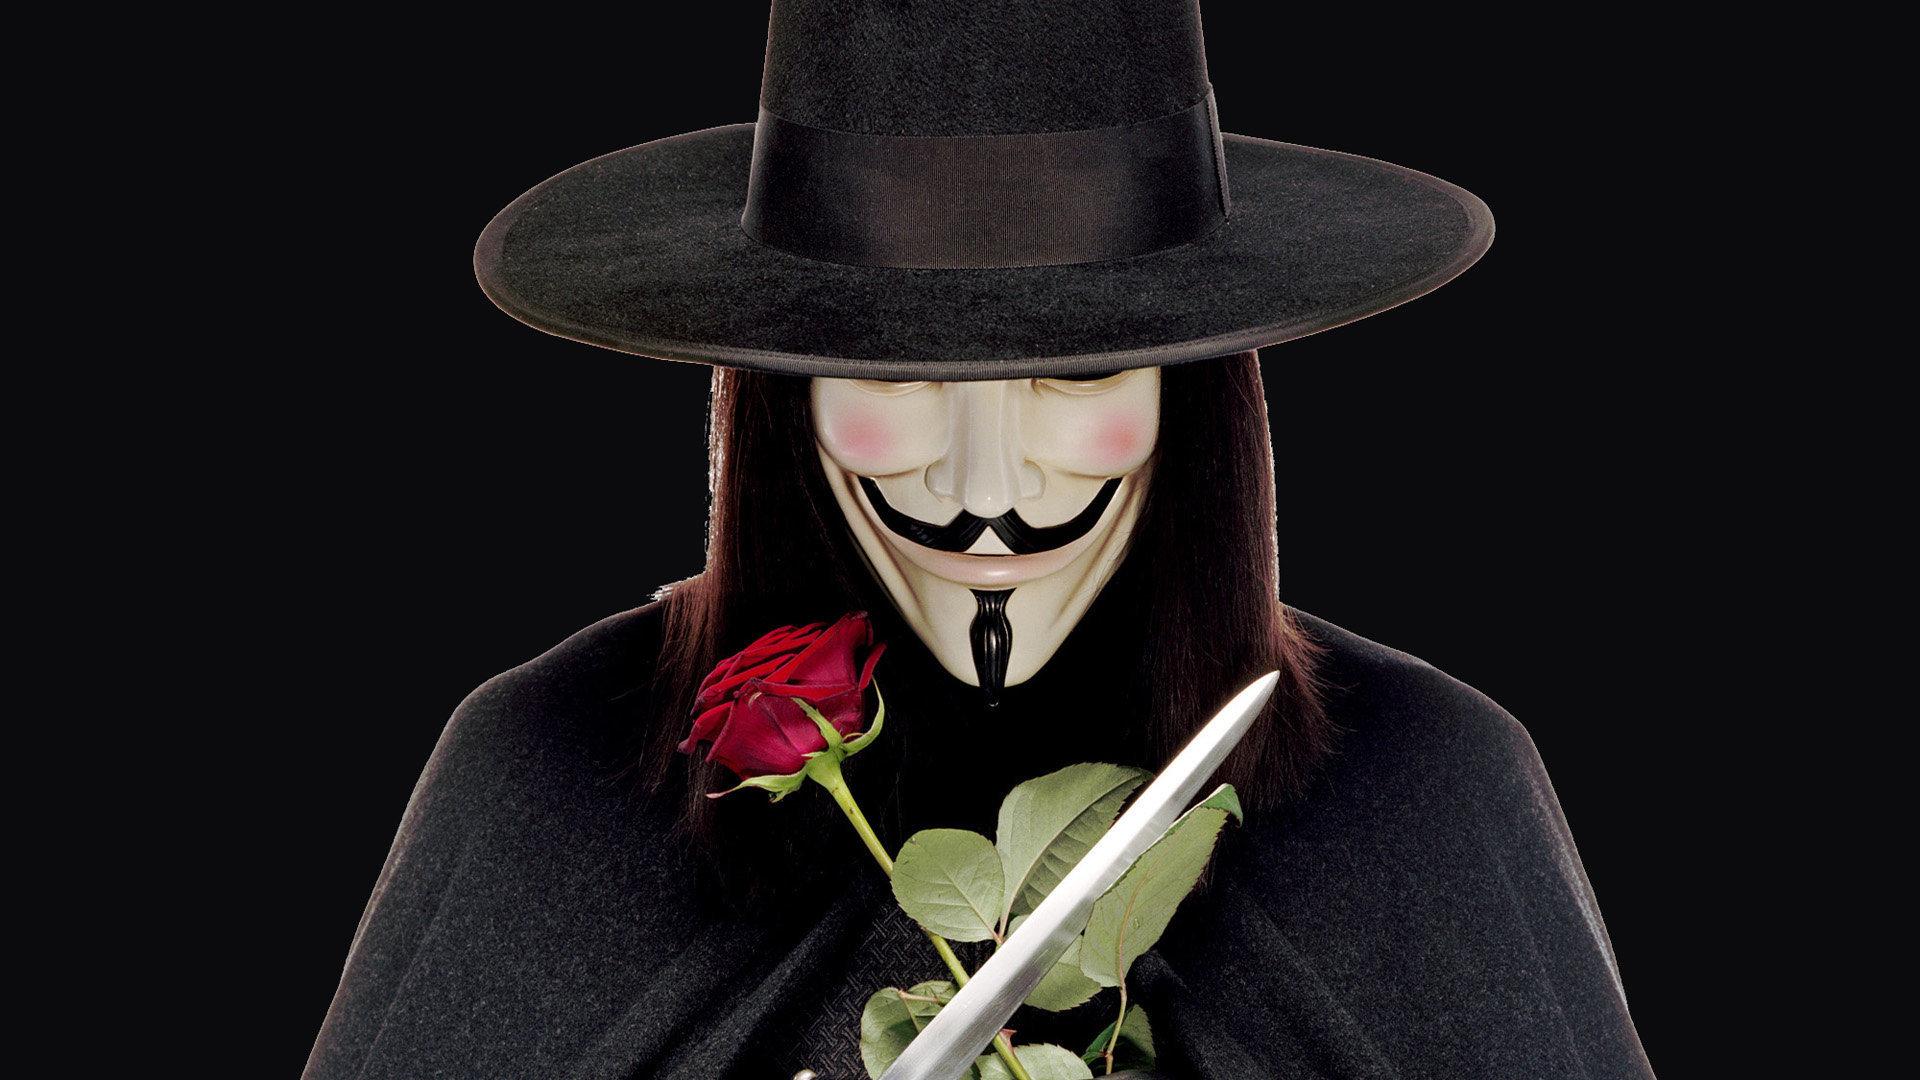 Best V For Vendetta Wallpaper ID92150 High Resolution Full Hd 1080p Desktop